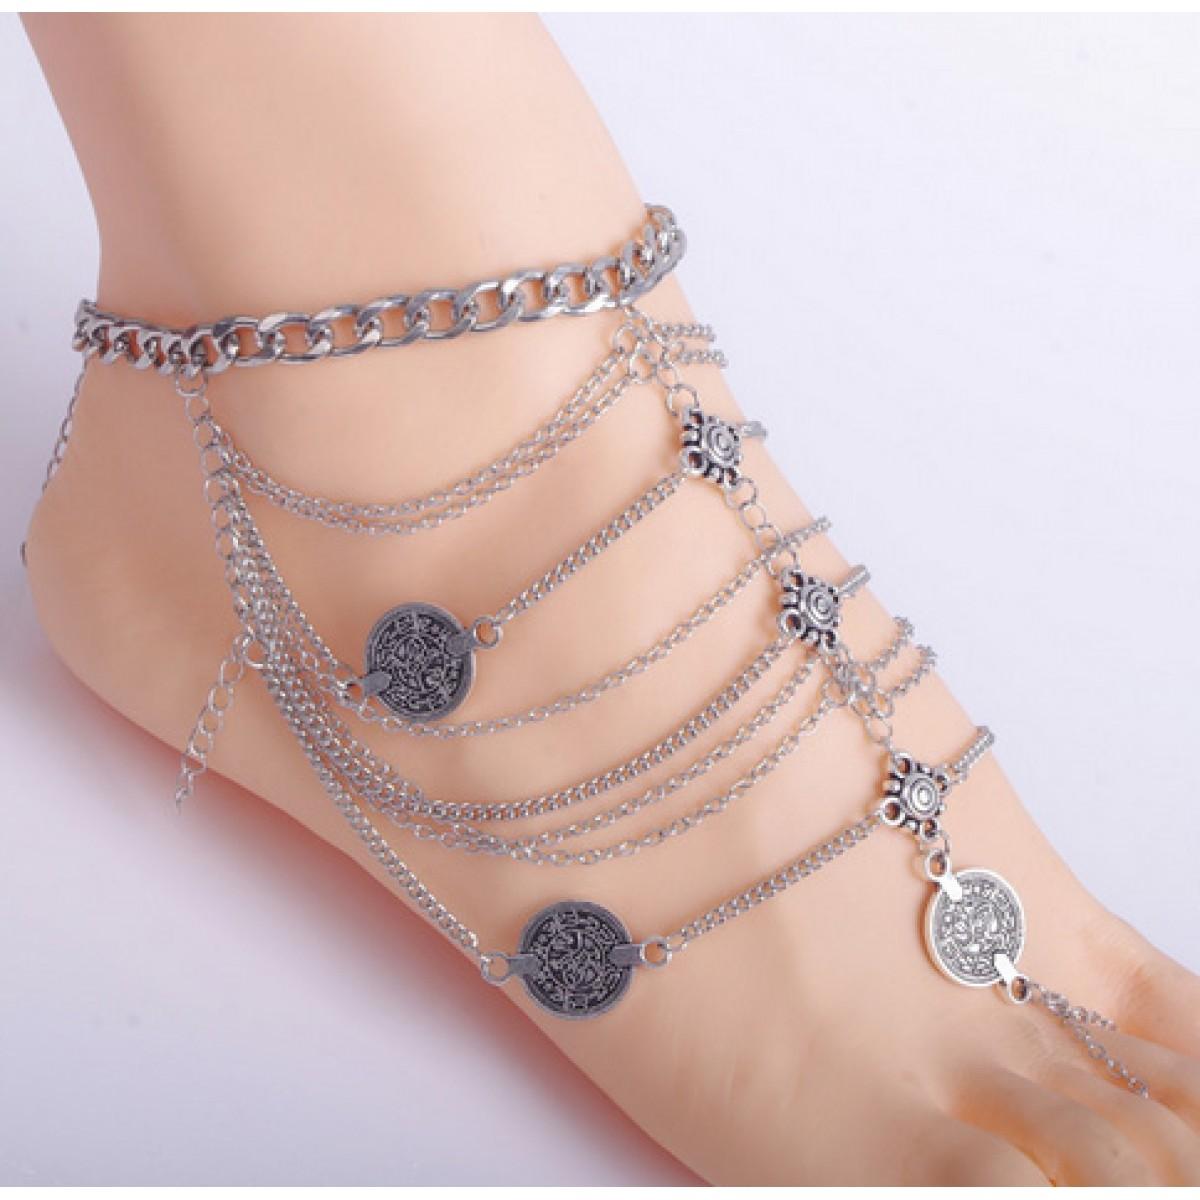 Vintage Silver Coin Ankle Bracelet For Women